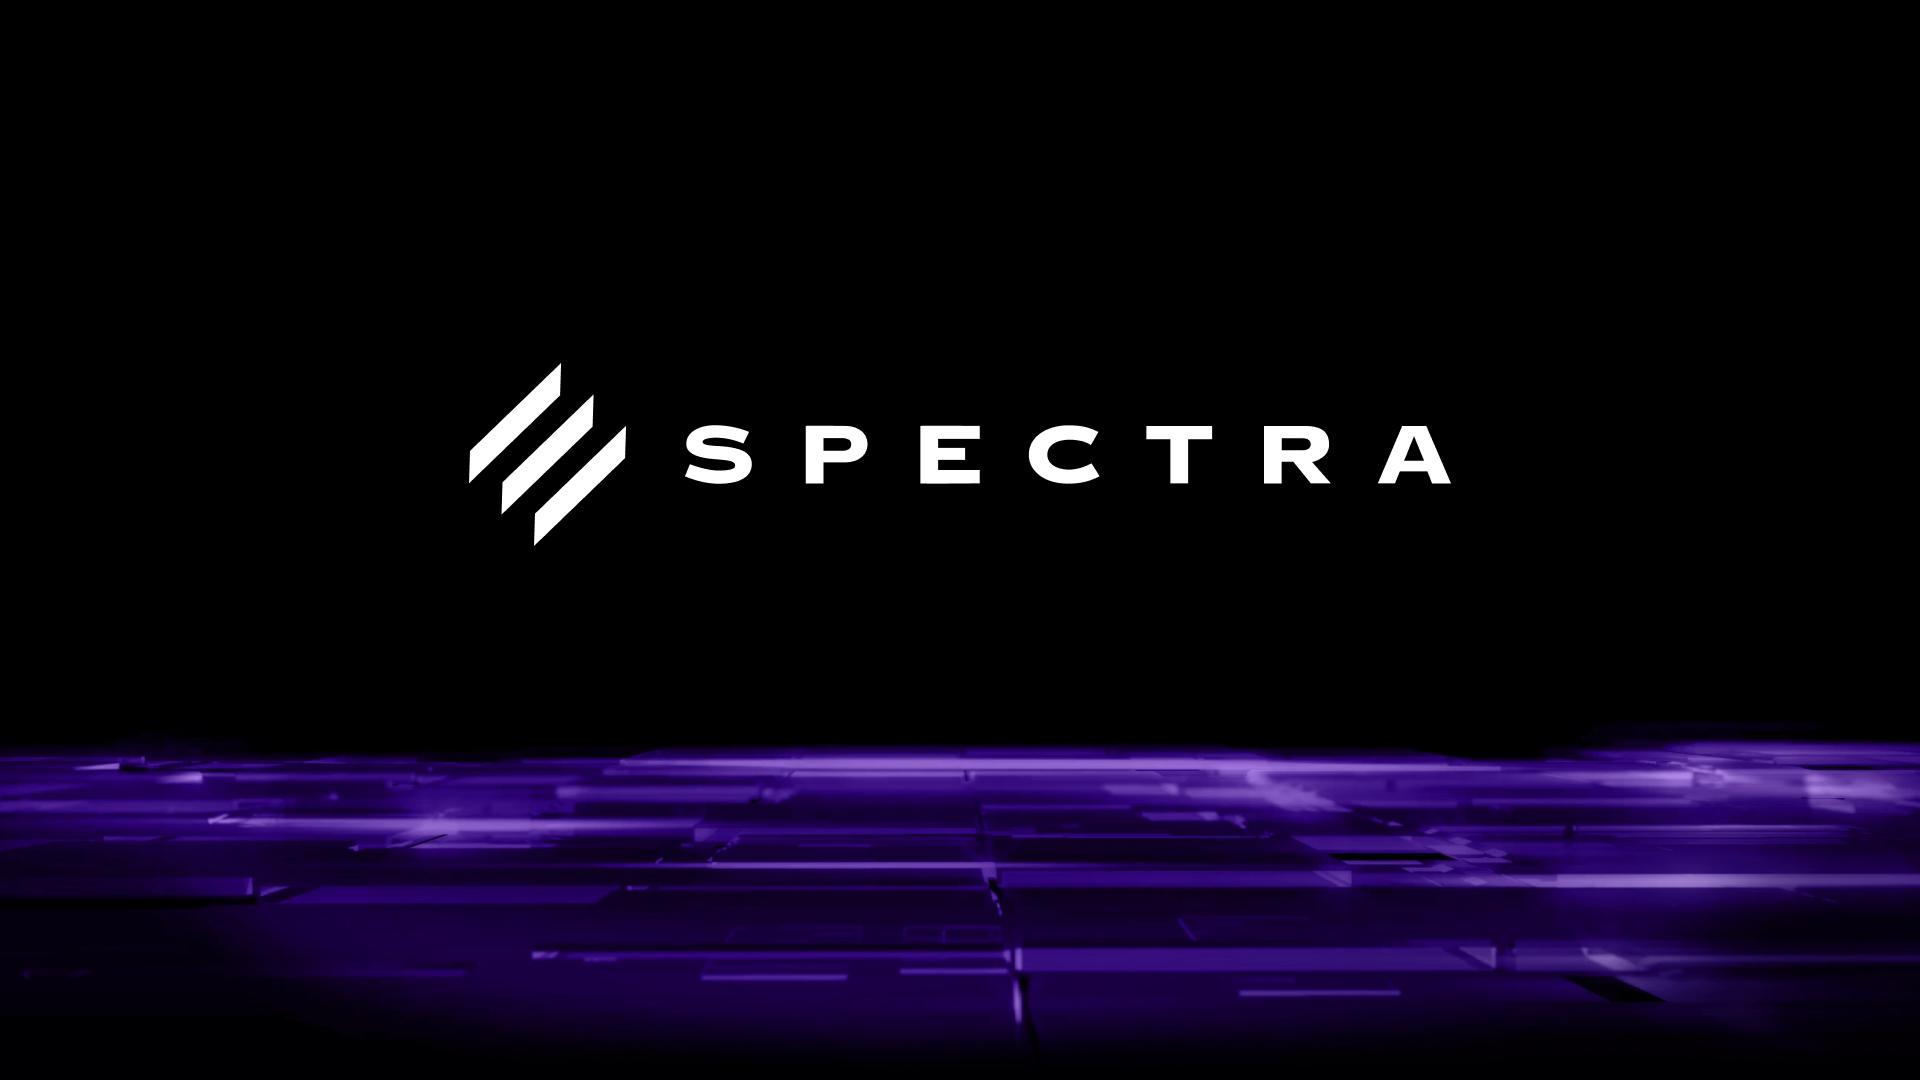 Spectra-logo-end